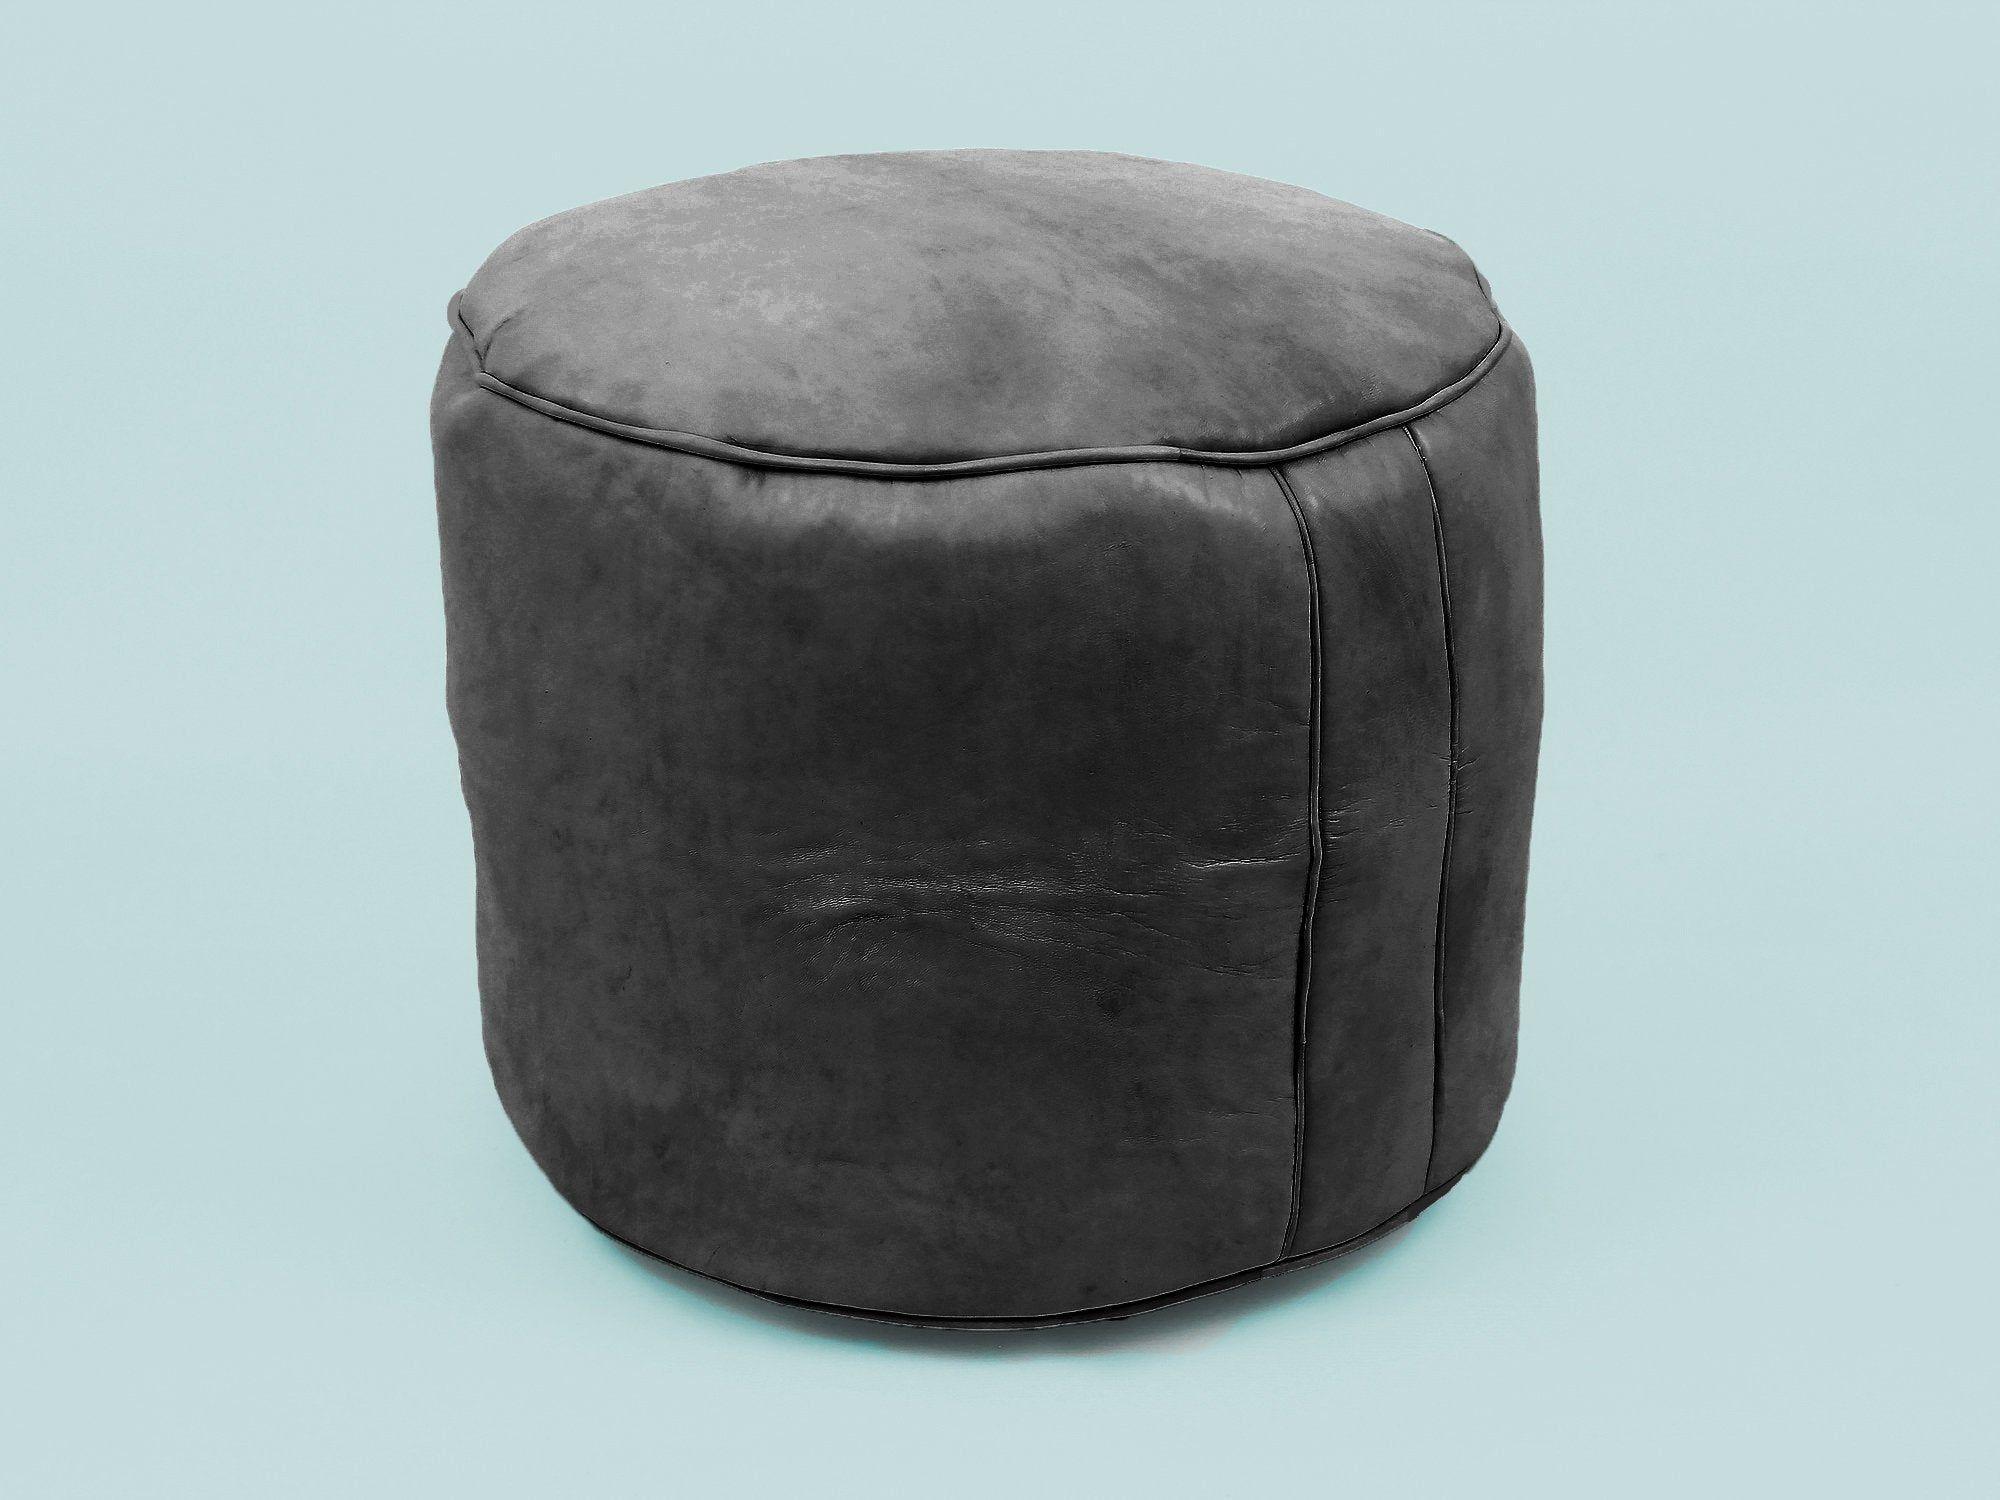 Peachy Black Leather Pouf Moroccan Leather Pouf Leather Ottoman Inzonedesignstudio Interior Chair Design Inzonedesignstudiocom